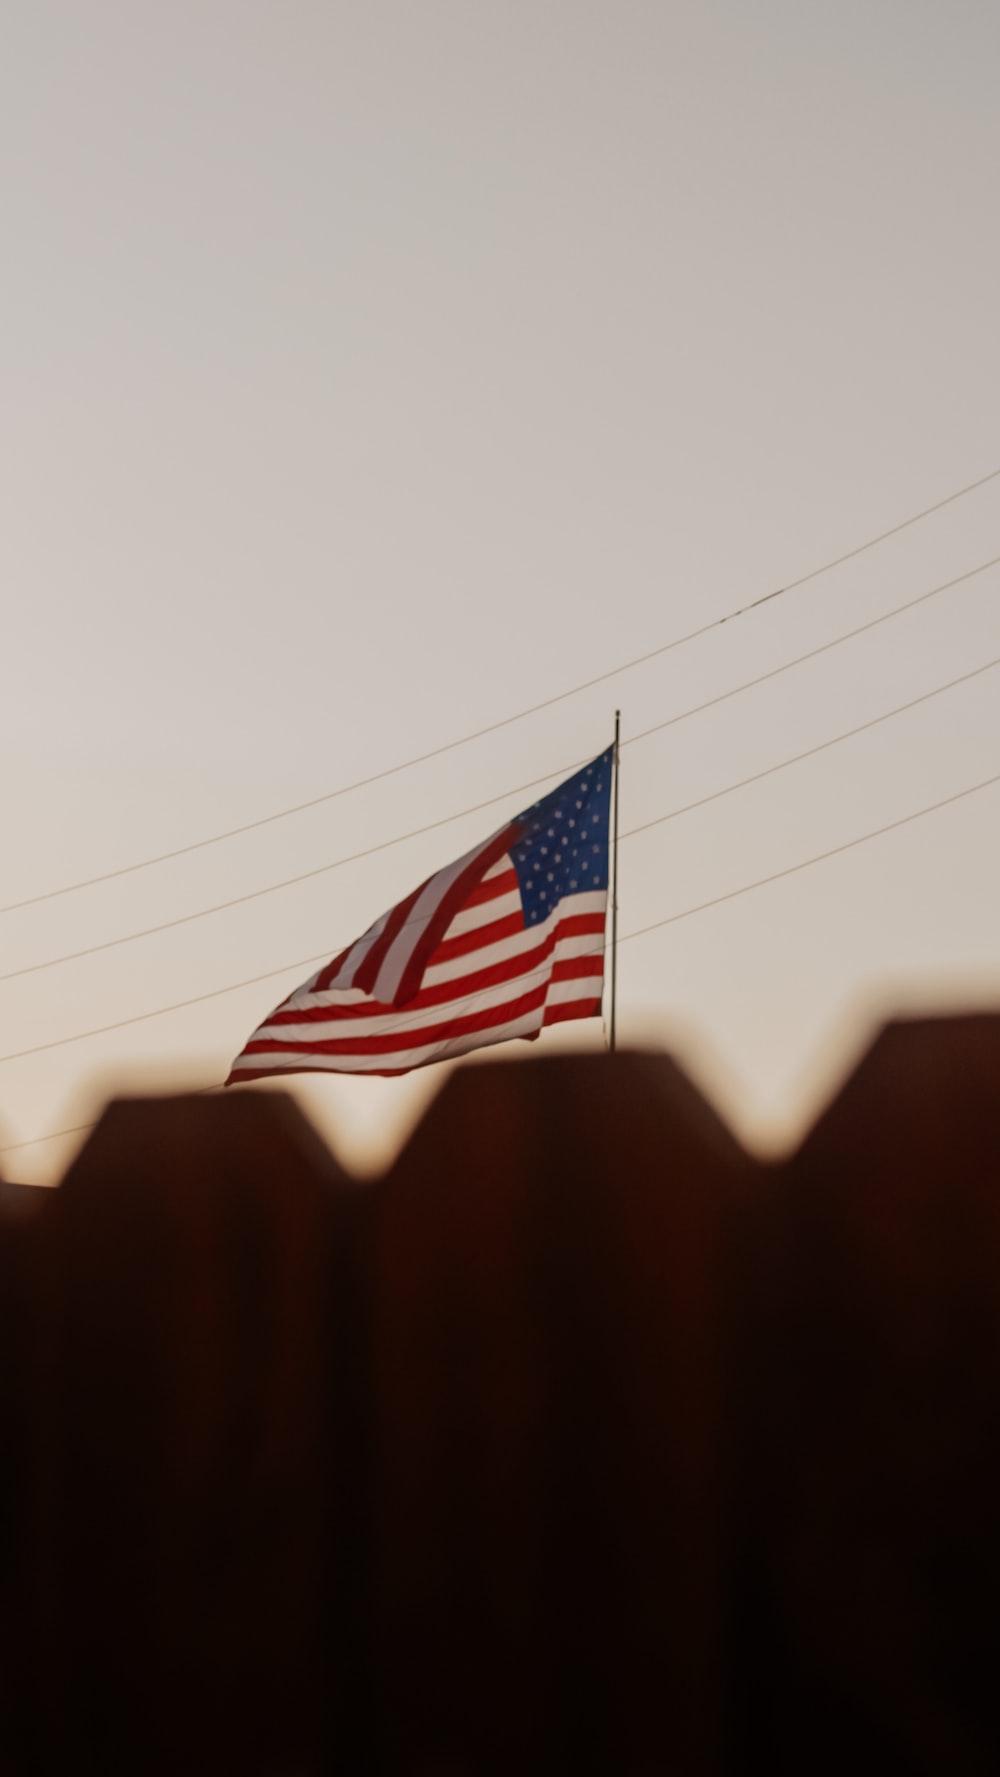 USA flag on focus photography